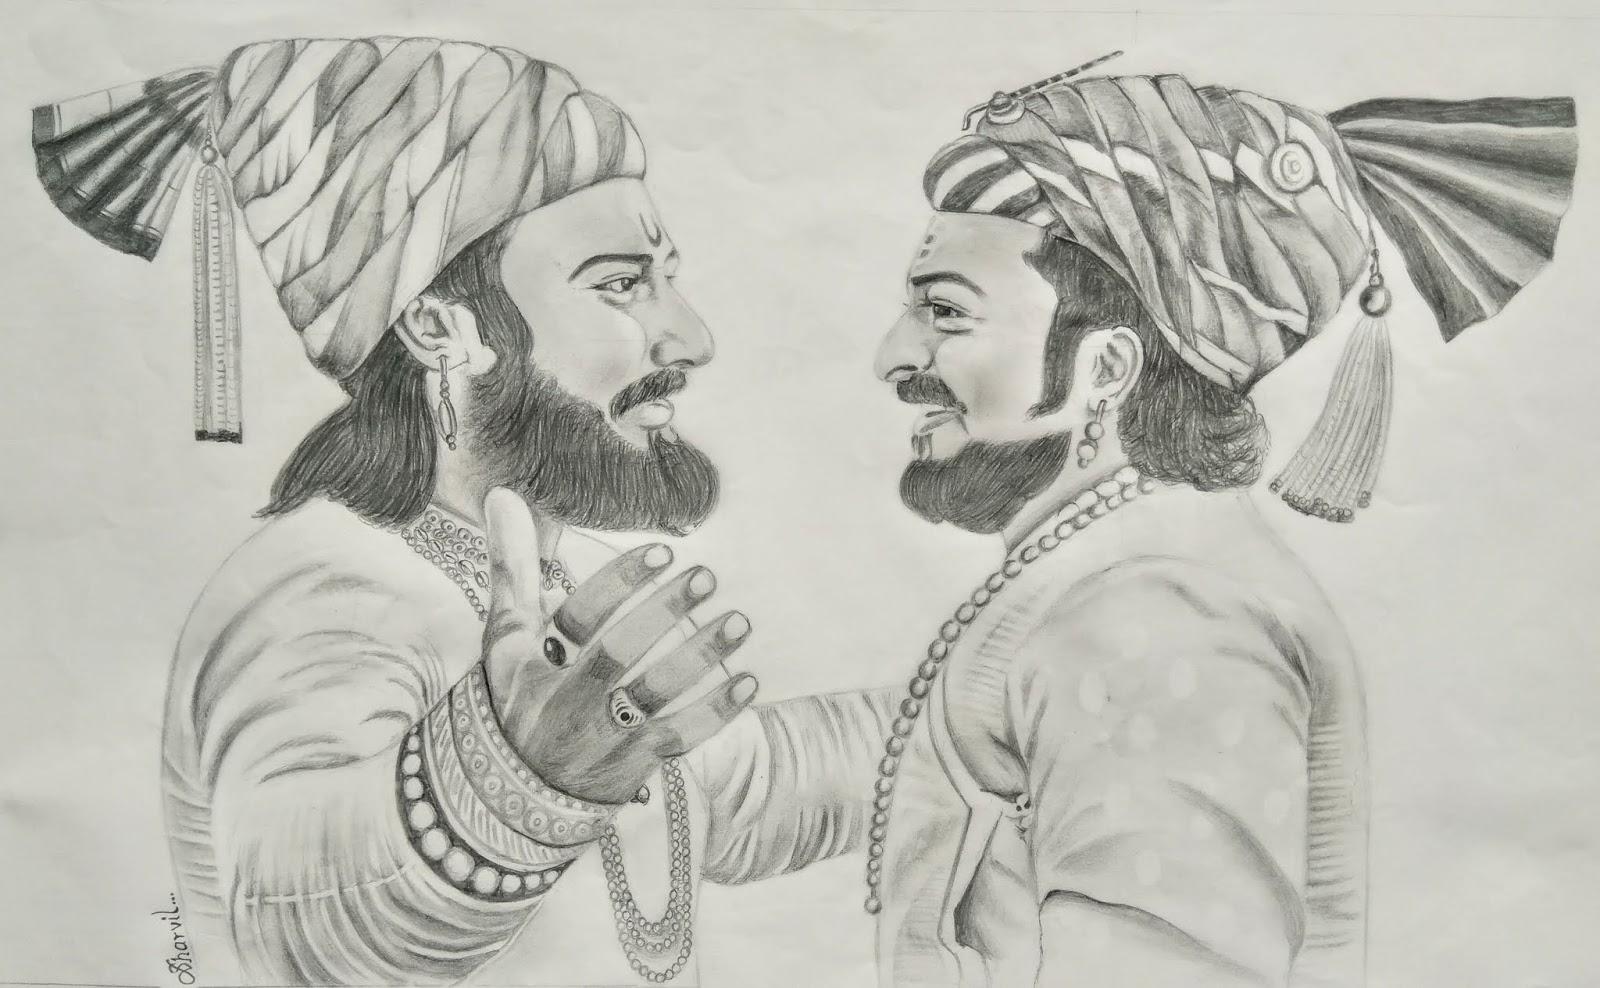 Shivaji sambhaji maharaj shivajimaharaj sambhajimaharaj sketch art pencil sketch pencilsketch charcoalsketch charcoal sketch sharvil patil